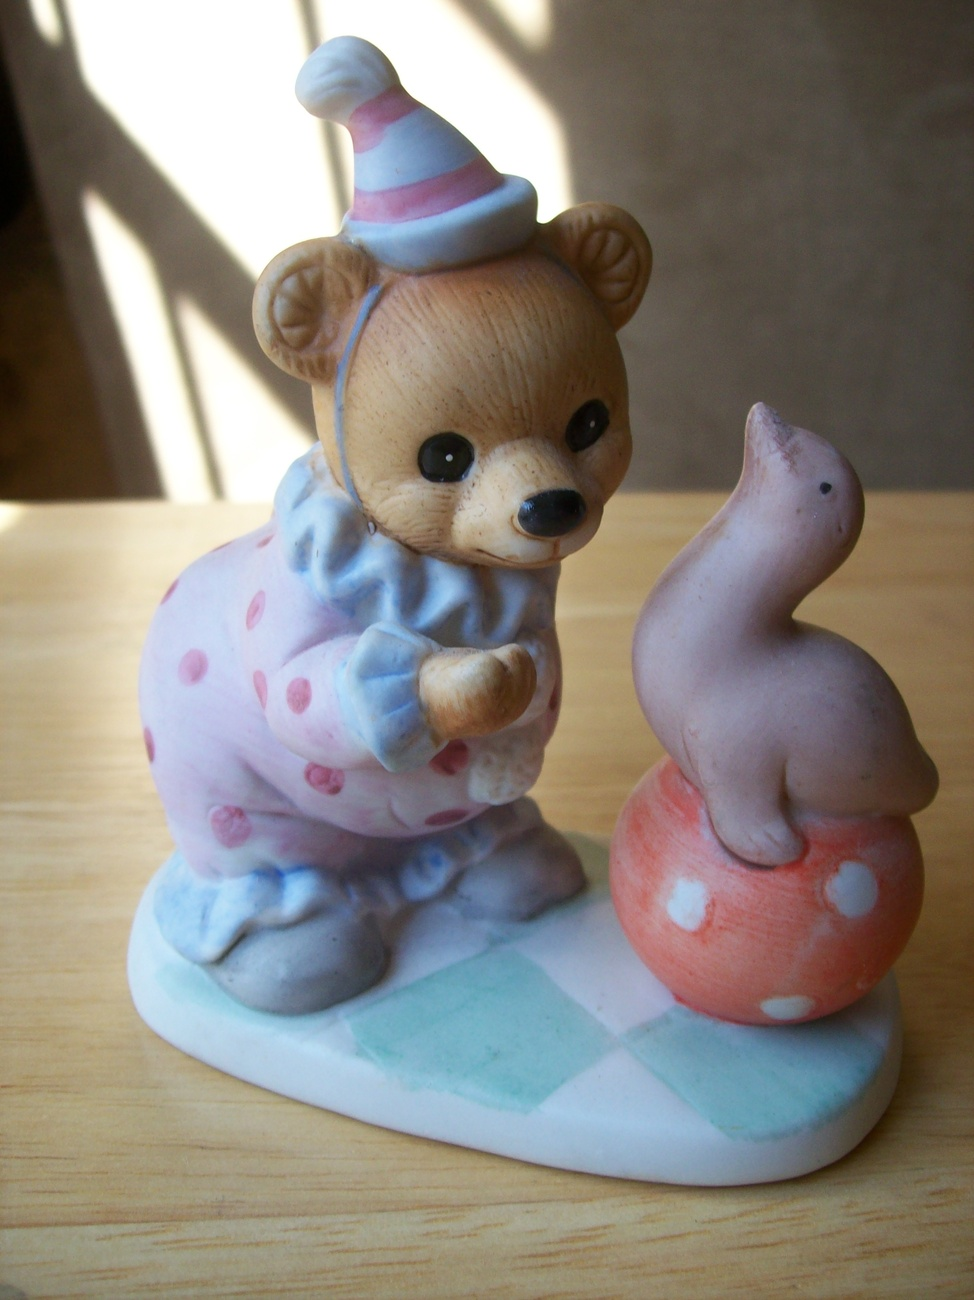 Homco Circus Bear with Seal Figurine #8881 - $16.00